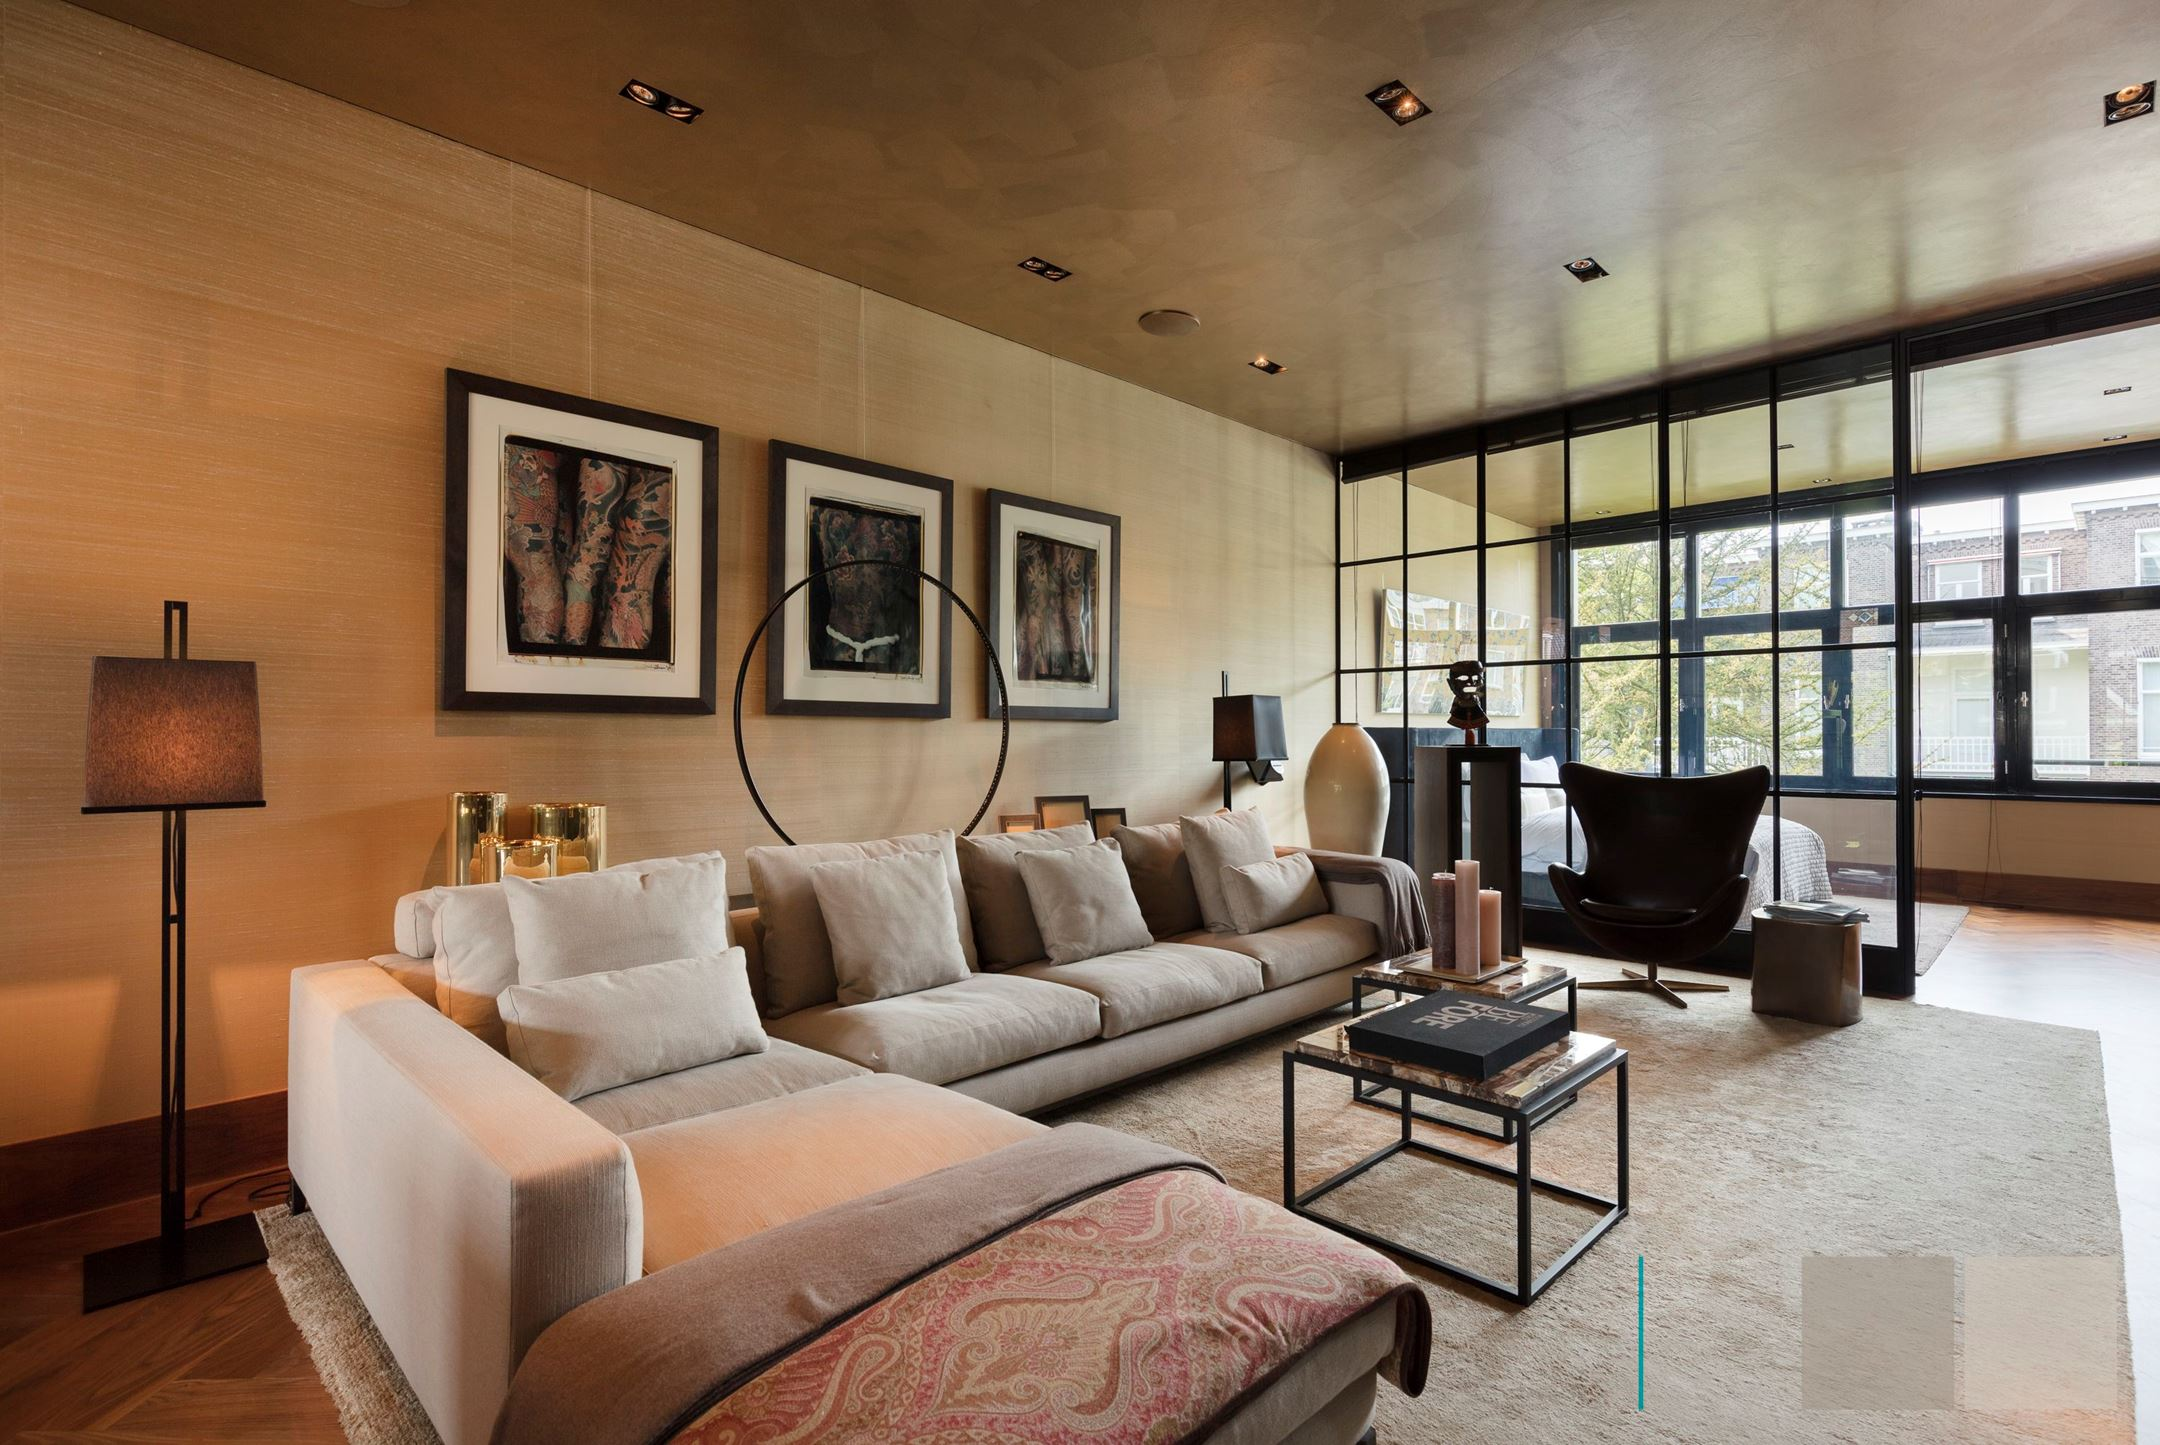 гостиная спальня диван перегородка